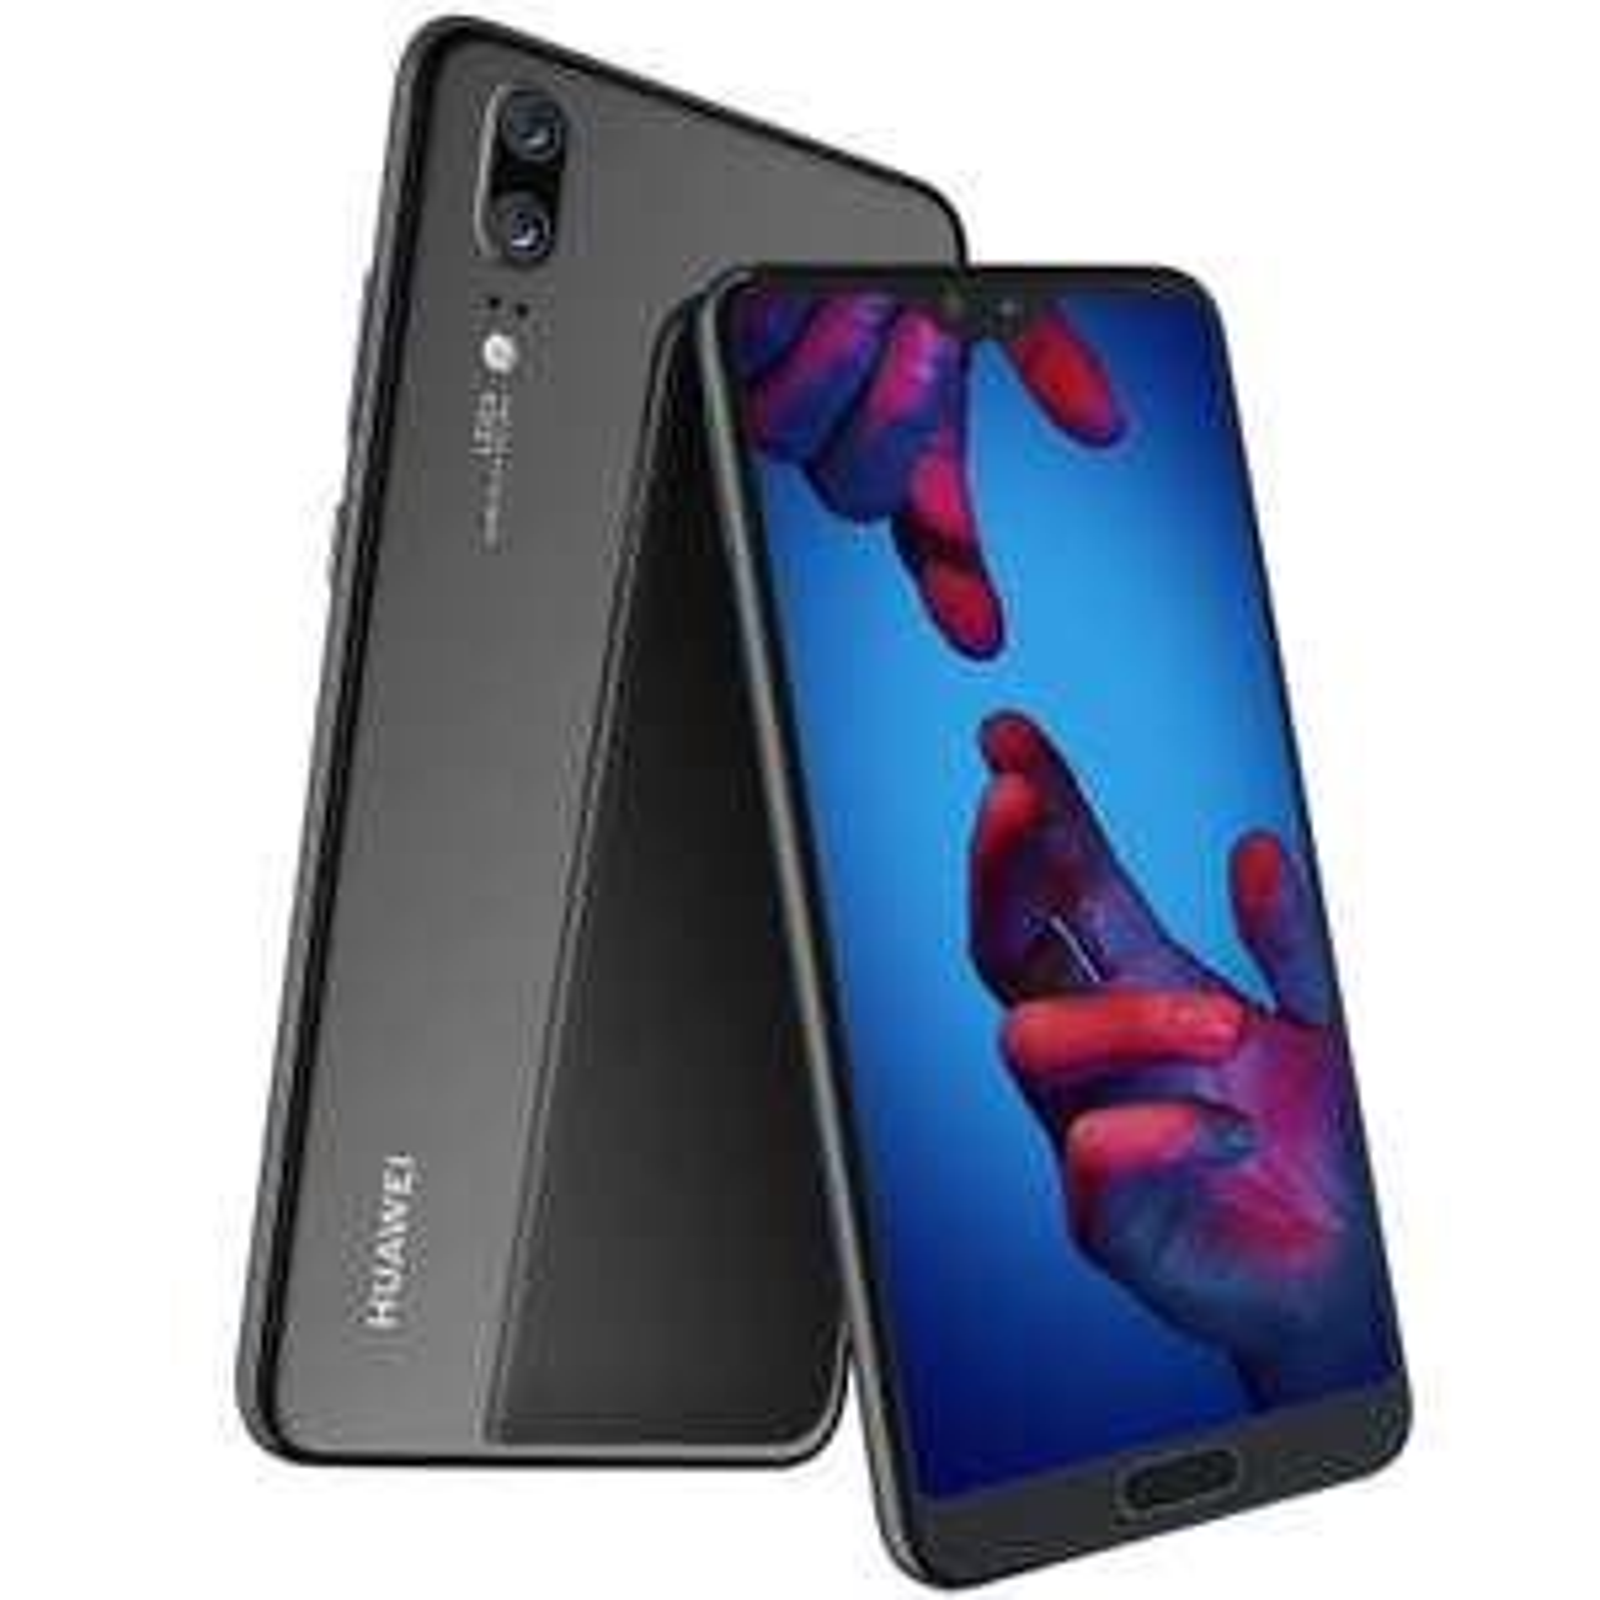 "Smartphone 5.84"" Huawei P20 à 349€ & 6.1"" Huawei P20 Pro à 549€ (via Bonus Reprise de 100€)"